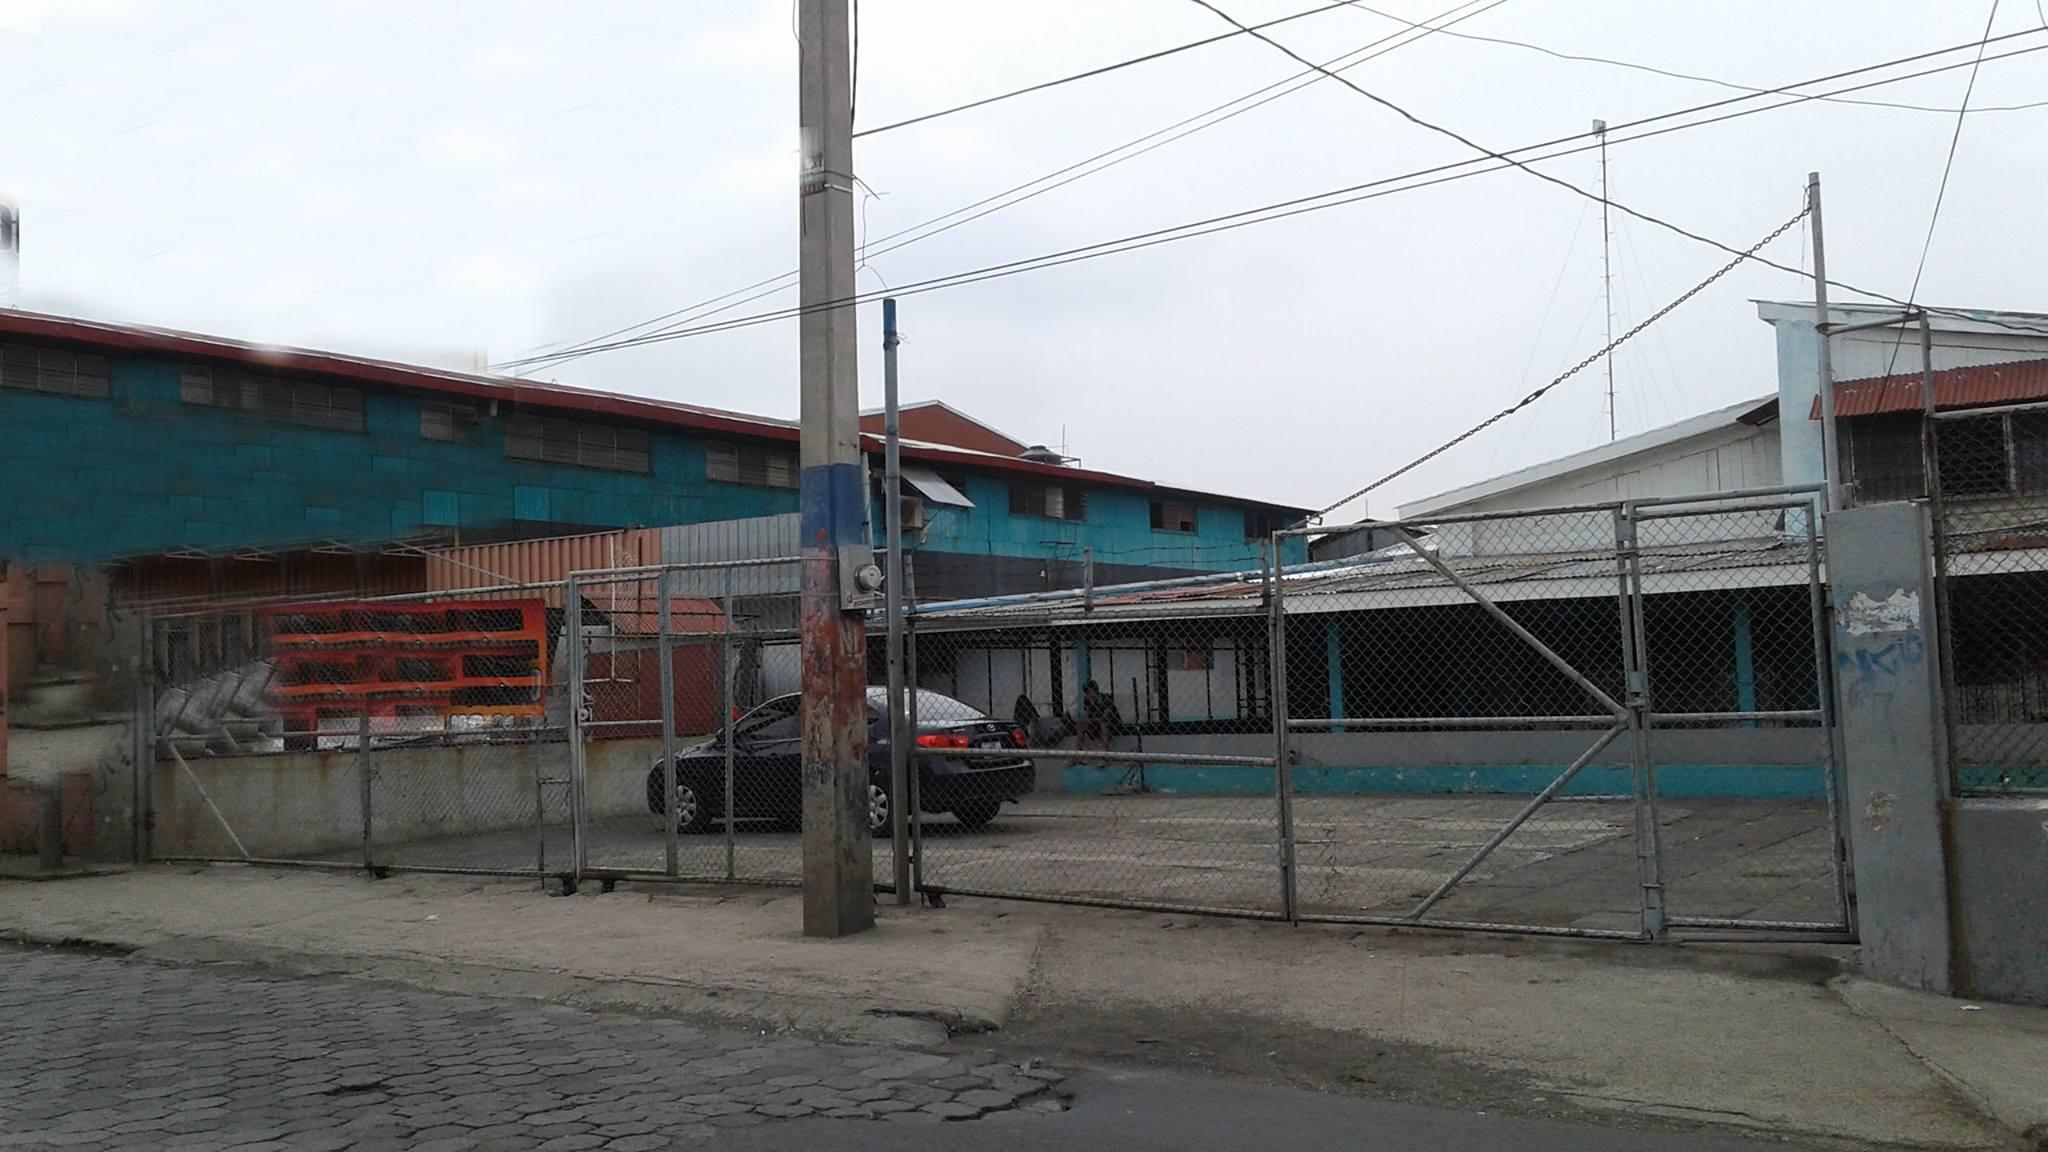 carretera-norte-kmc-bienes-raices-9342335 (15)